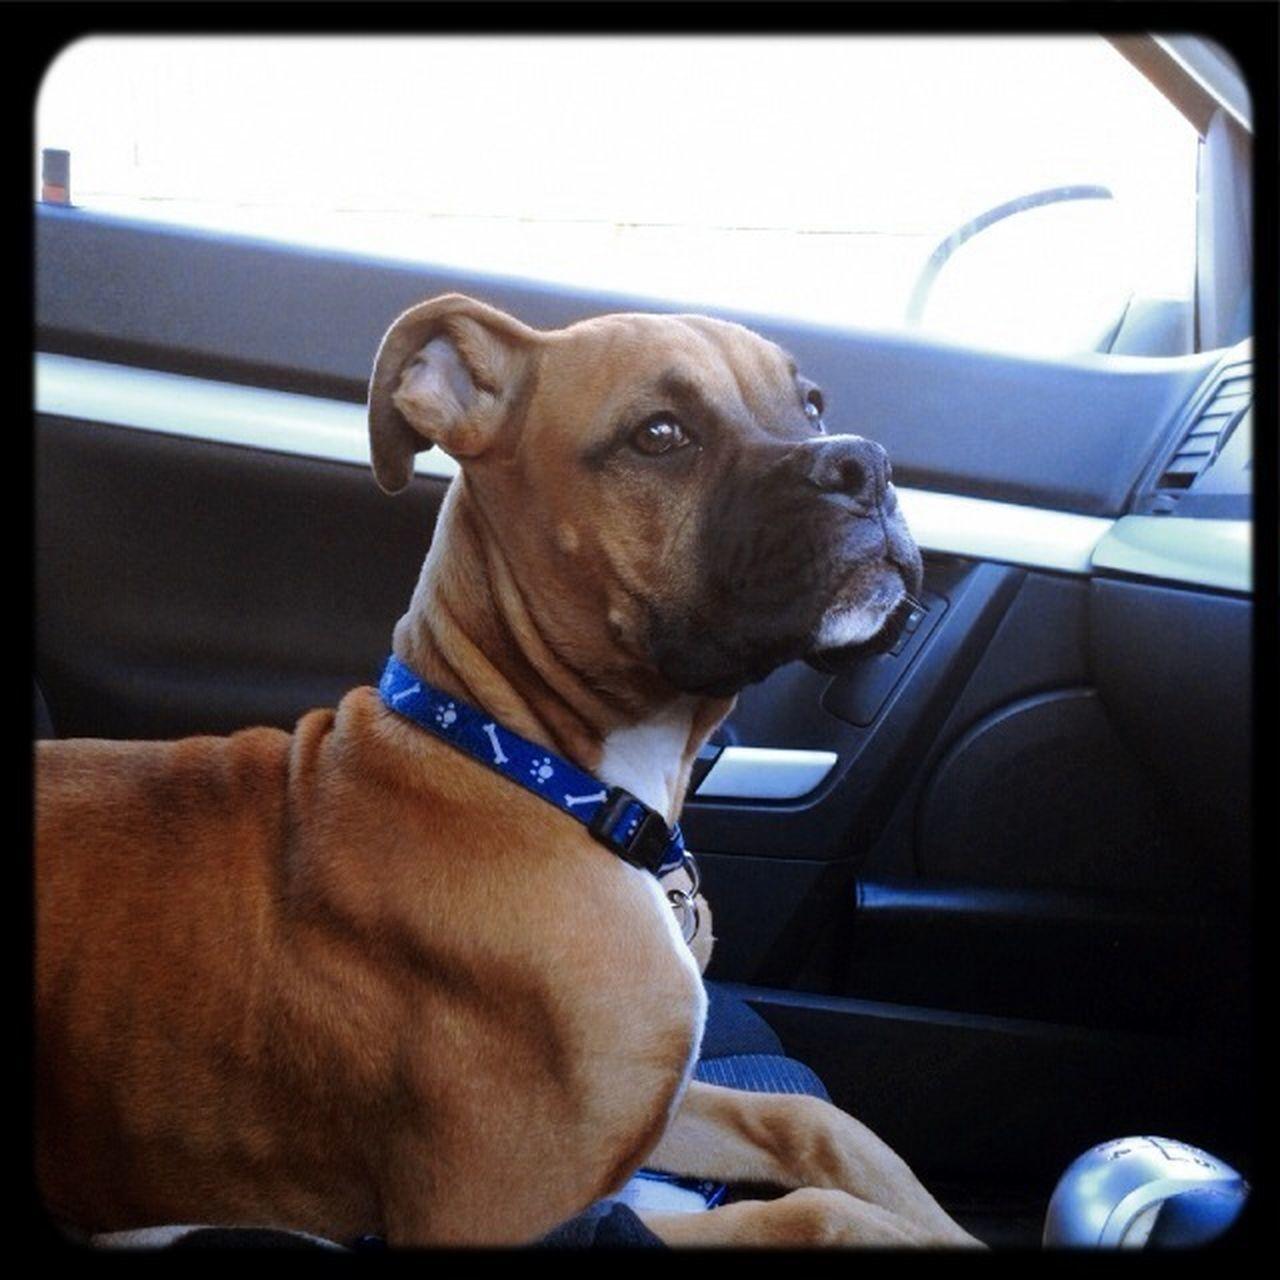 car, transportation, dog, sitting, car interior, one animal, mammal, land vehicle, mode of transport, domestic animals, pets, day, animal themes, no people